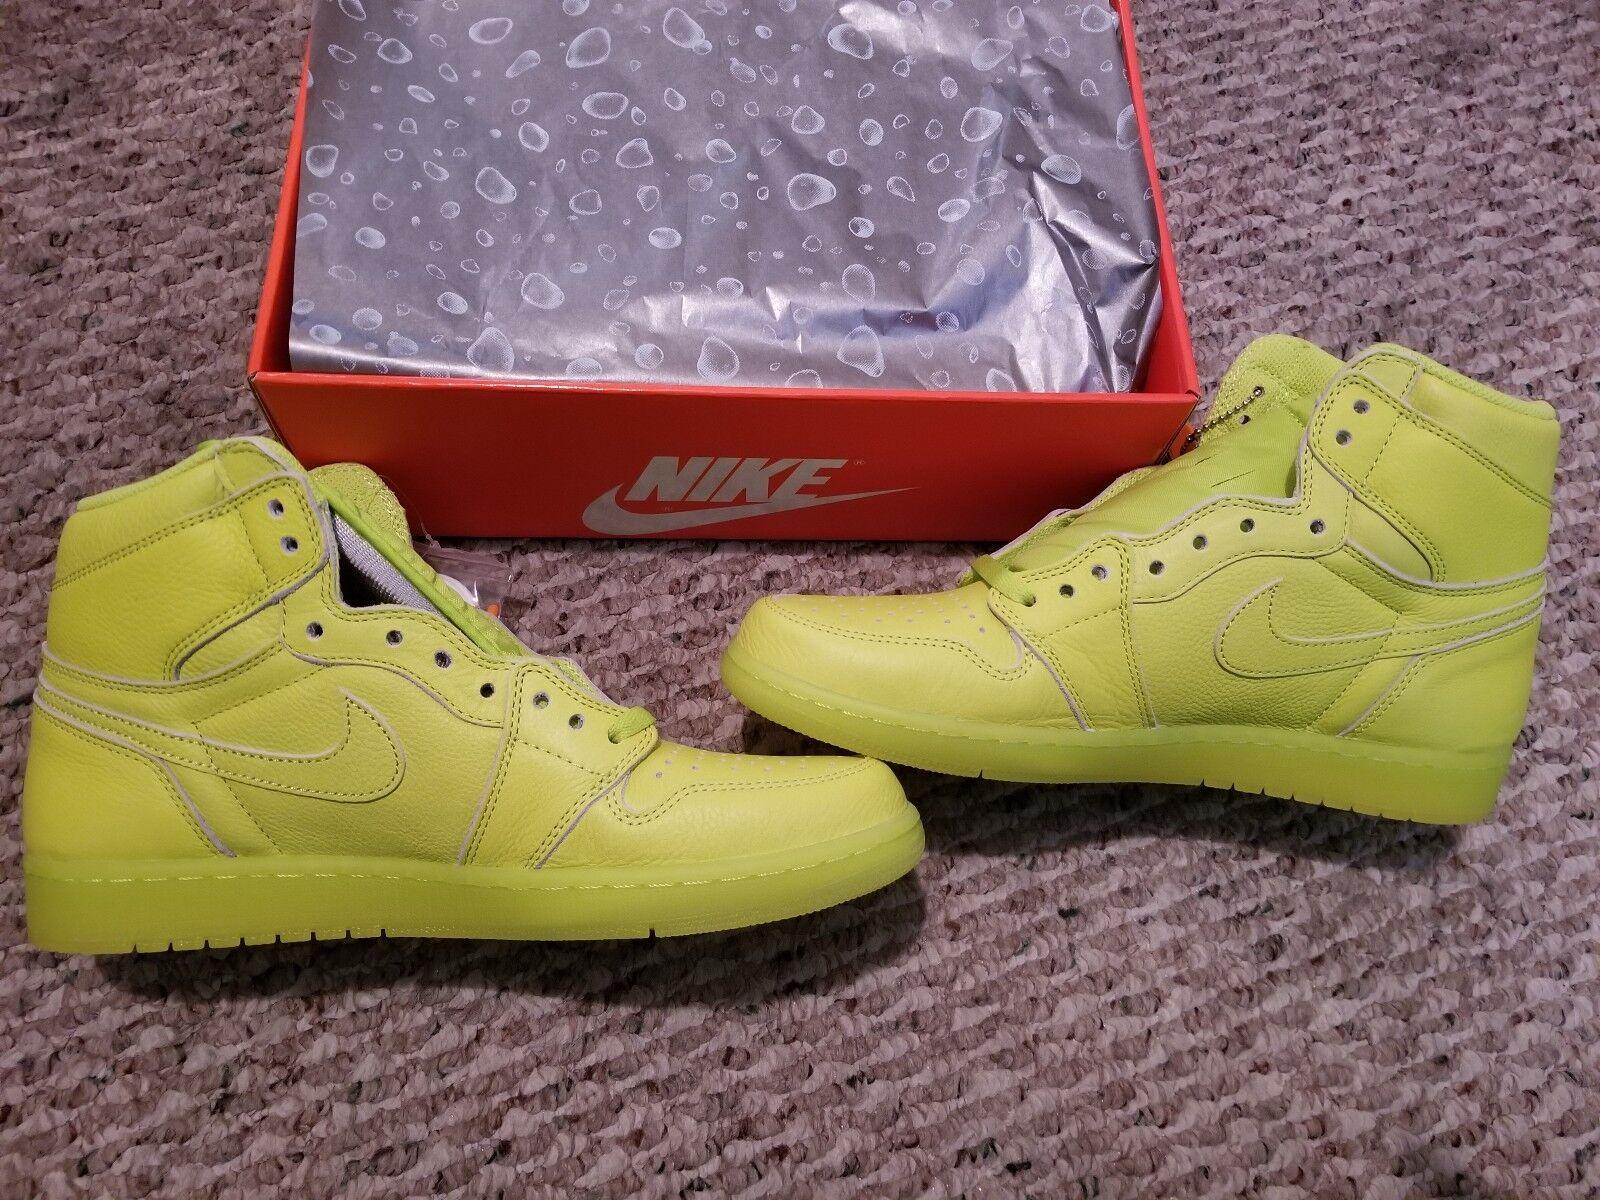 Nike Lemon Air Jordan 1 Retro High Gatorade Cyber Yellow Lemon Nike Lime AJ5997-345 sz 11 f78dfa